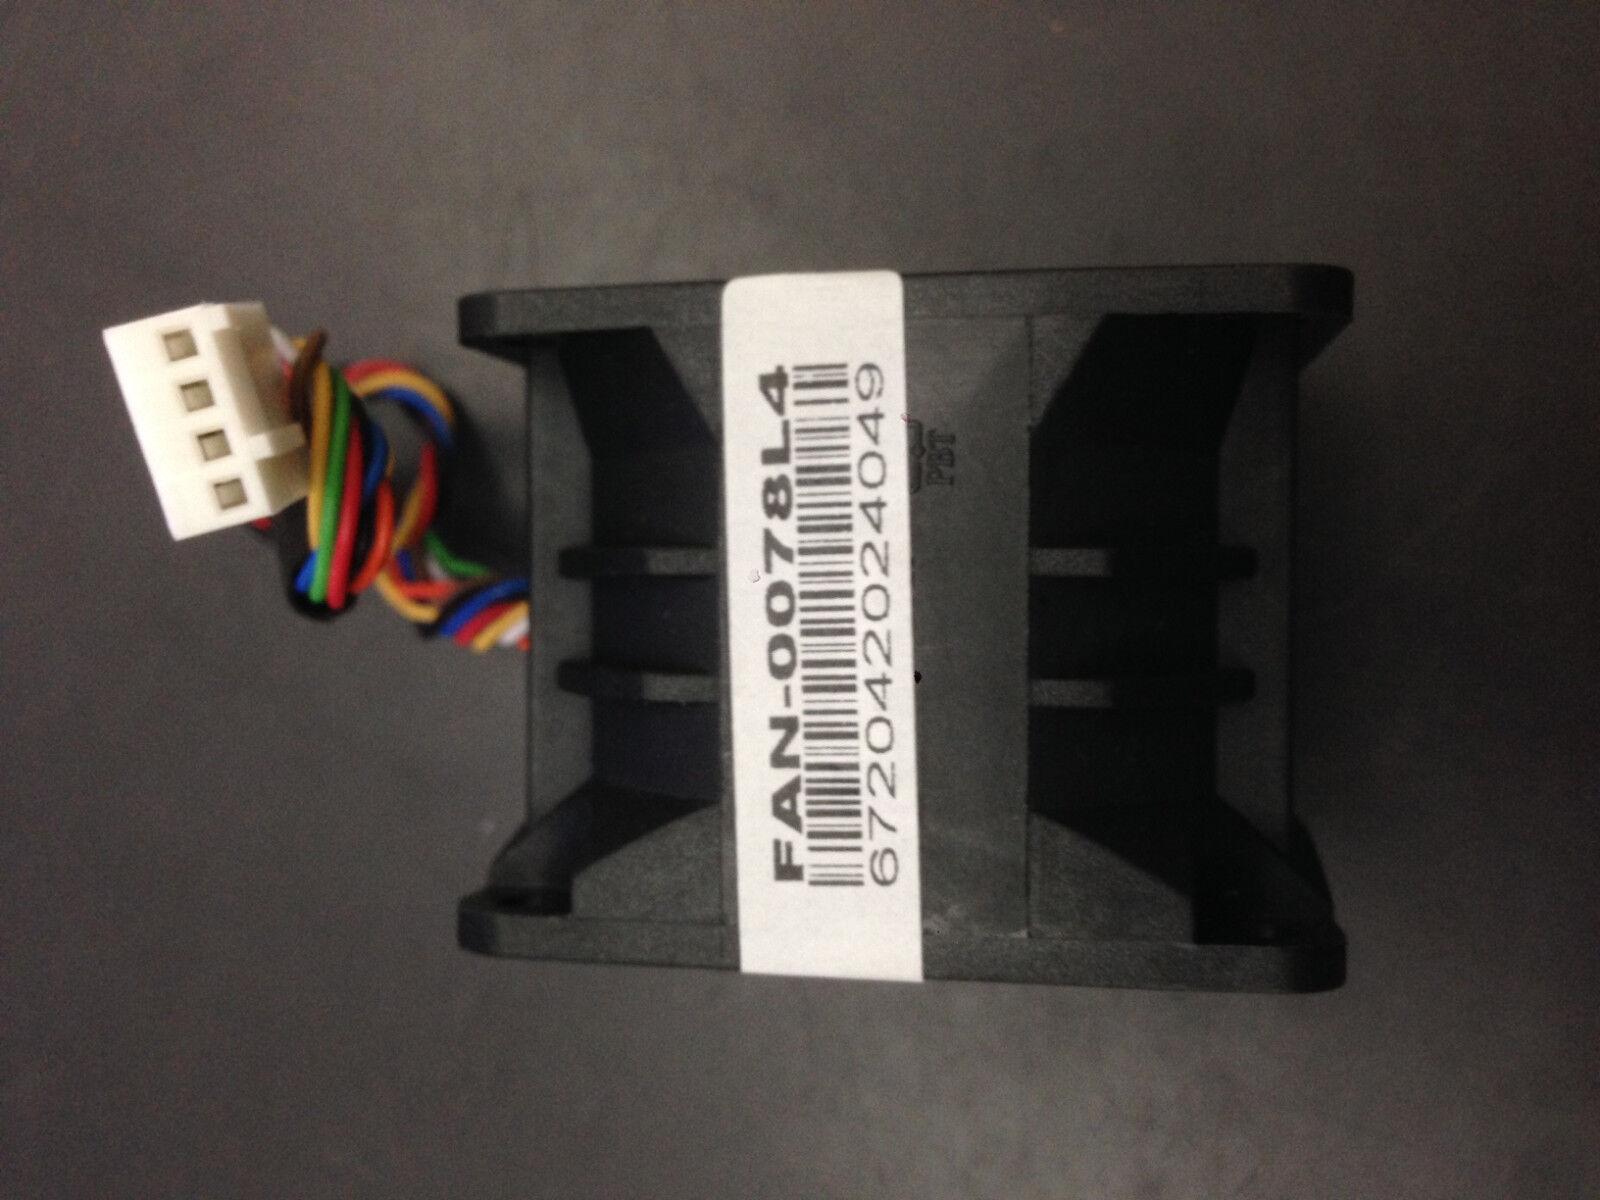 *NEW* Supermicro FAN-0078L4 40x50x38, 4 Pin PWM Fan Assembly for SC513, 813M